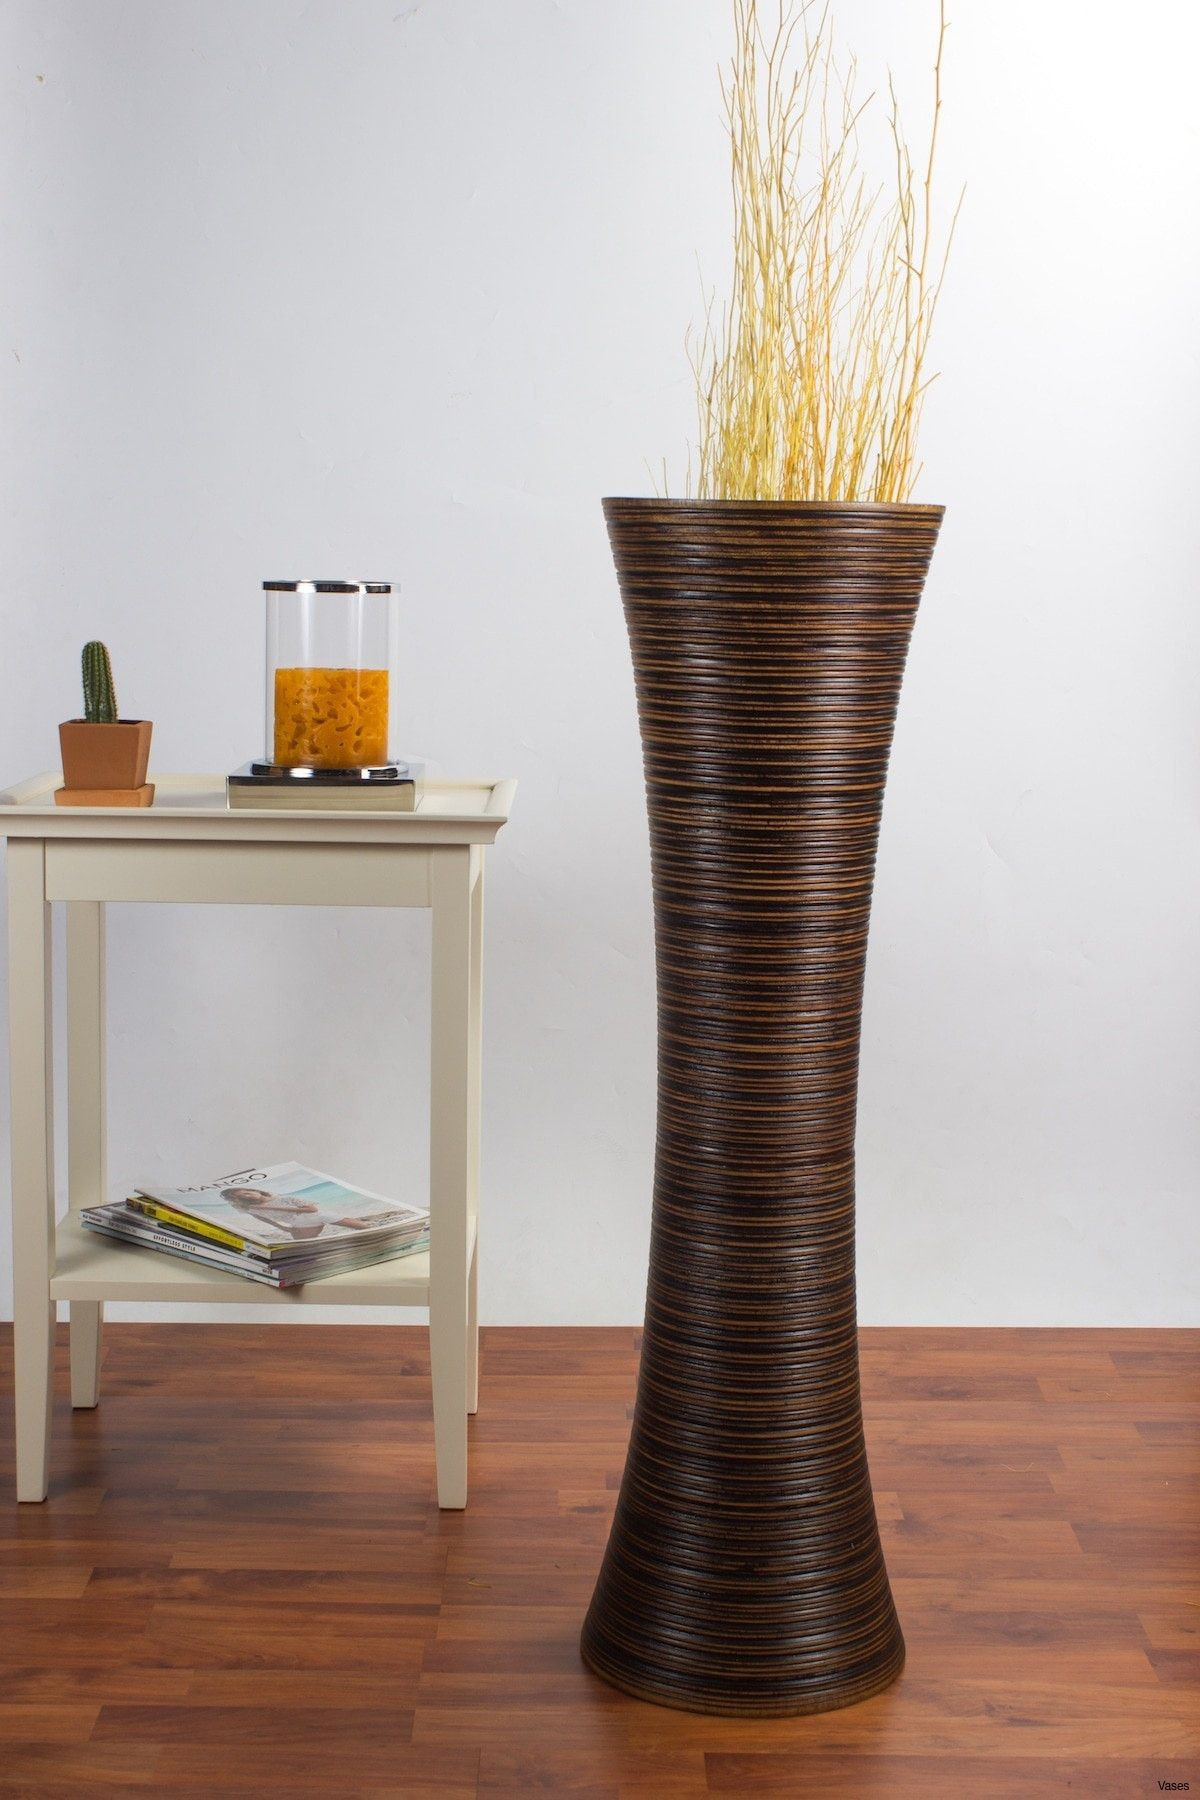 mirrored glass vases wholesale of tall decorative vases luxury decorative floor vases fresh d dkbrw within tall decorative vases luxury decorative floor vases fresh d dkbrw 5749 1h vases tall brown i